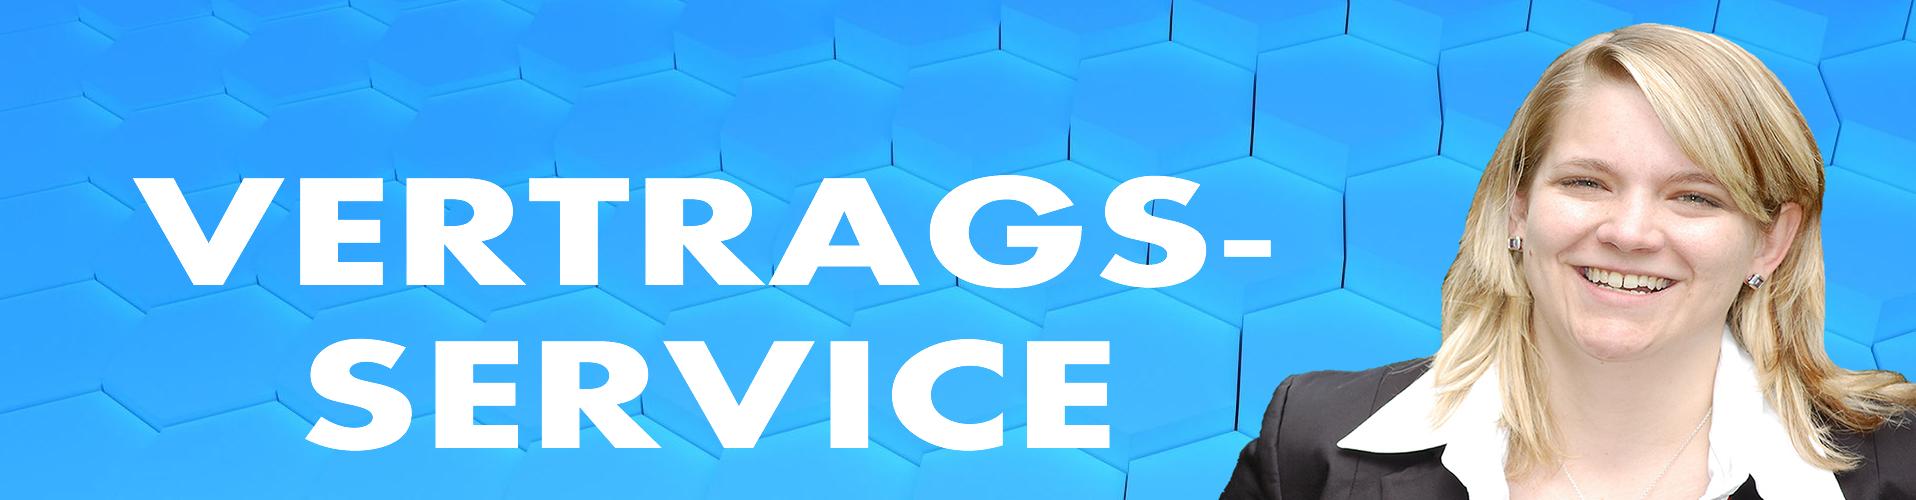 Vertrags-Service